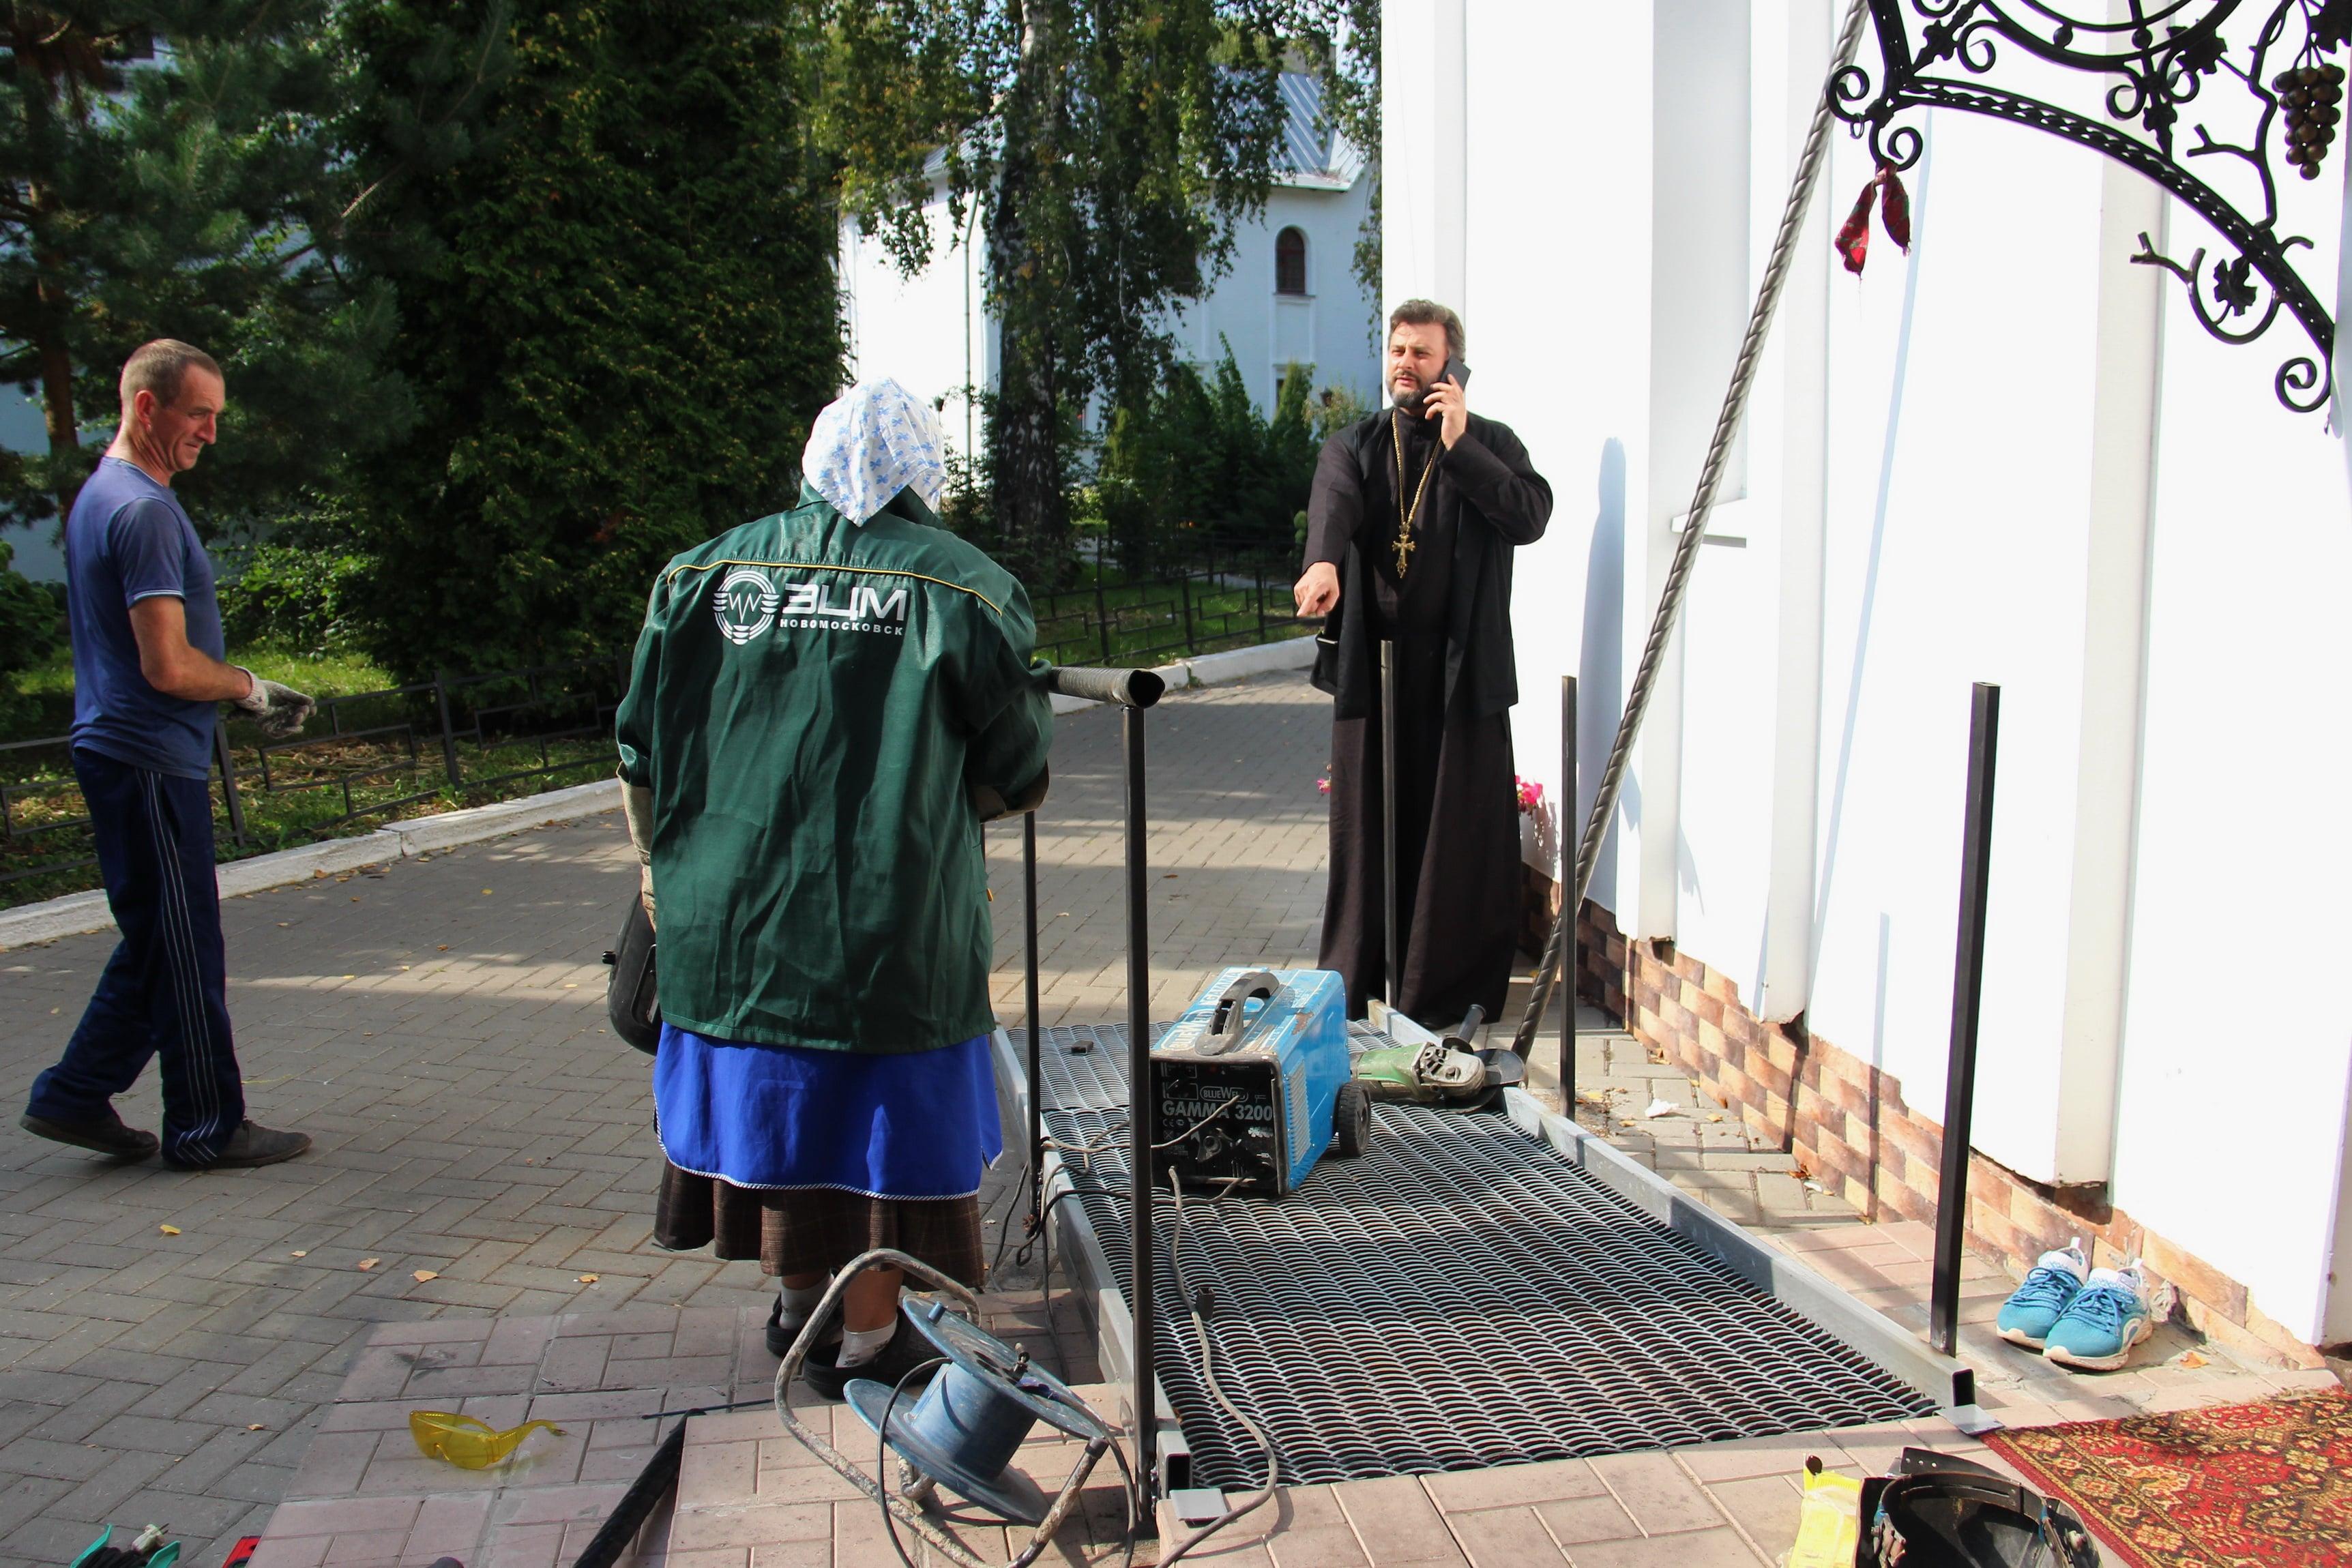 http://monuspen.ru/photoreports/9df63e5e9d77c5739c4060bc33b07f8d.JPG